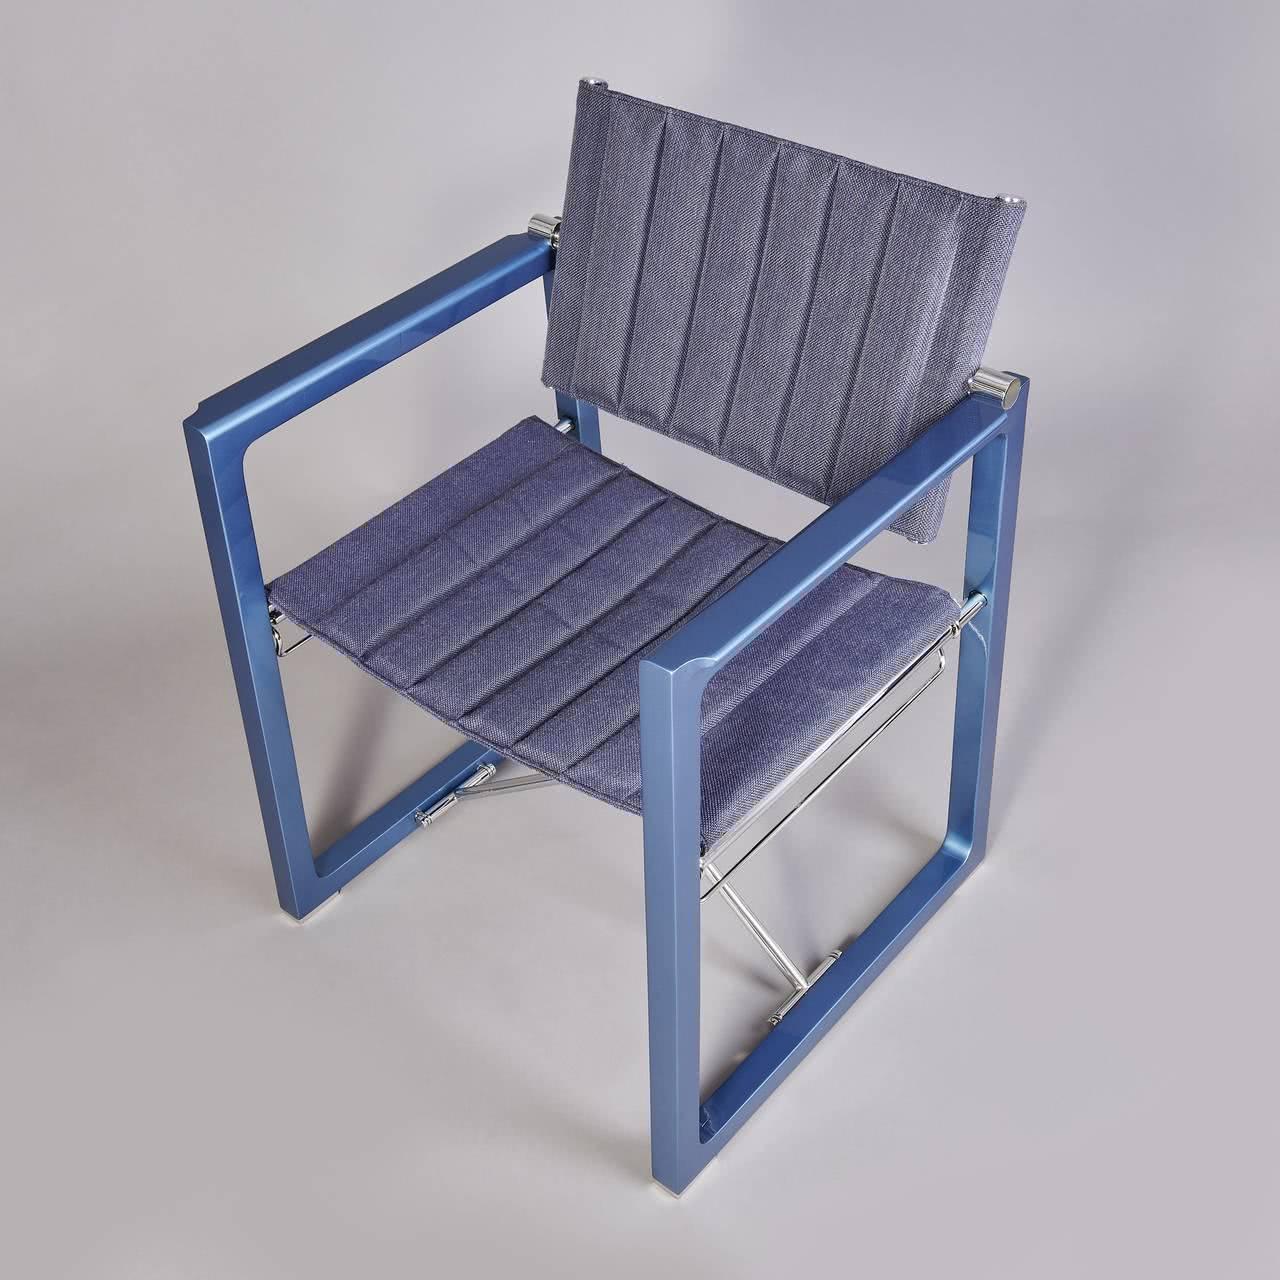 Octoport Superyacht Deck Furniture